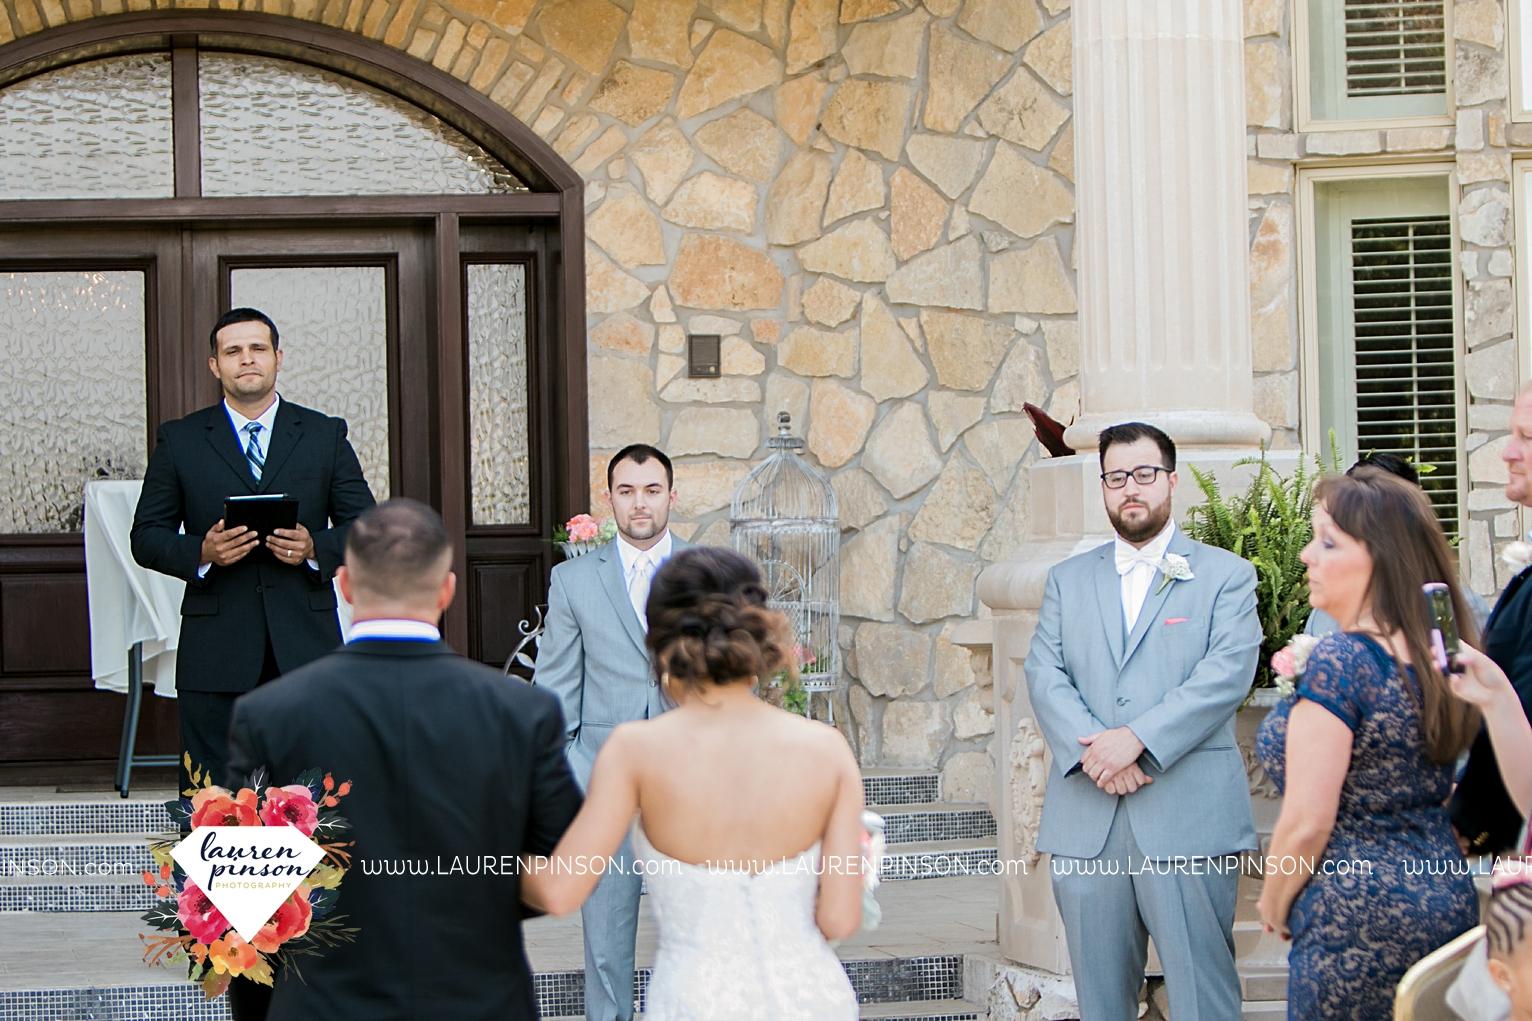 wichita-falls-wedding-nocona-comanche-rose-ranch-rustic-pink-gray-photography-00135.jpg